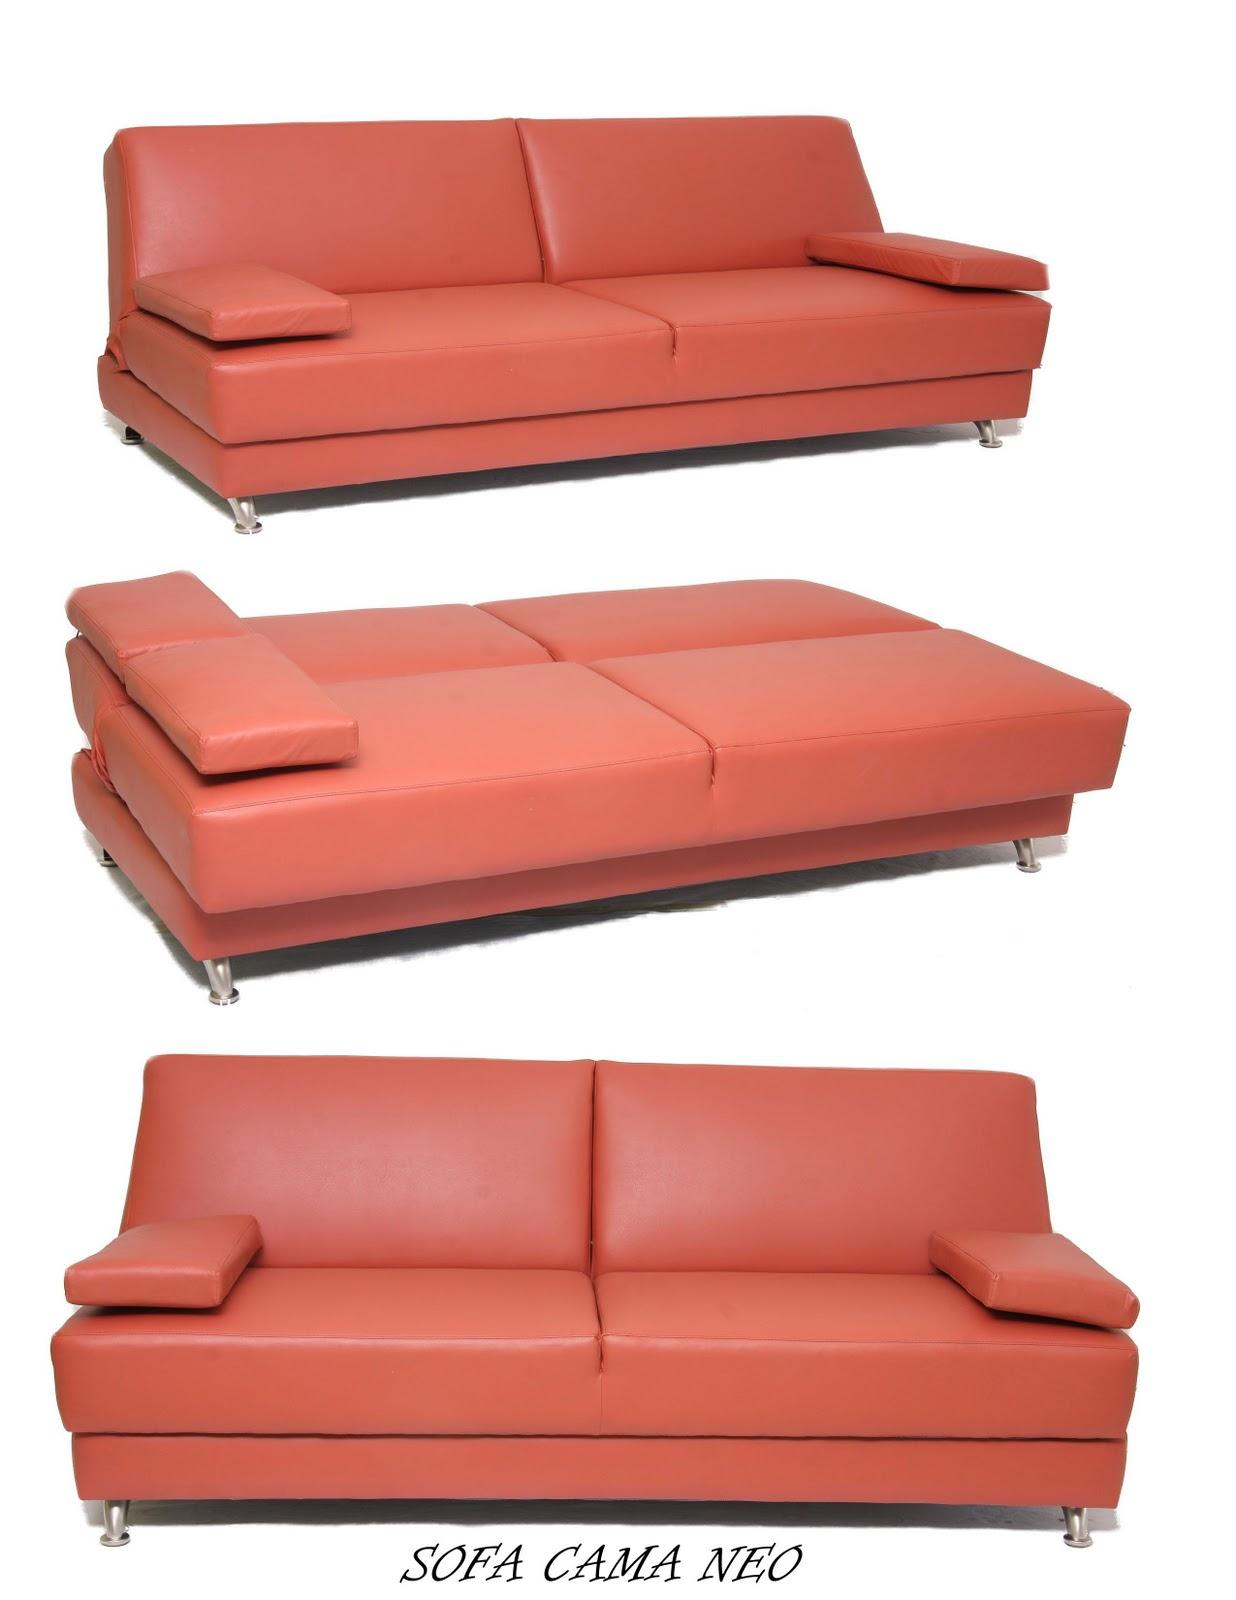 Muebles pader sofa cama neo - Muebles sofas camas ...